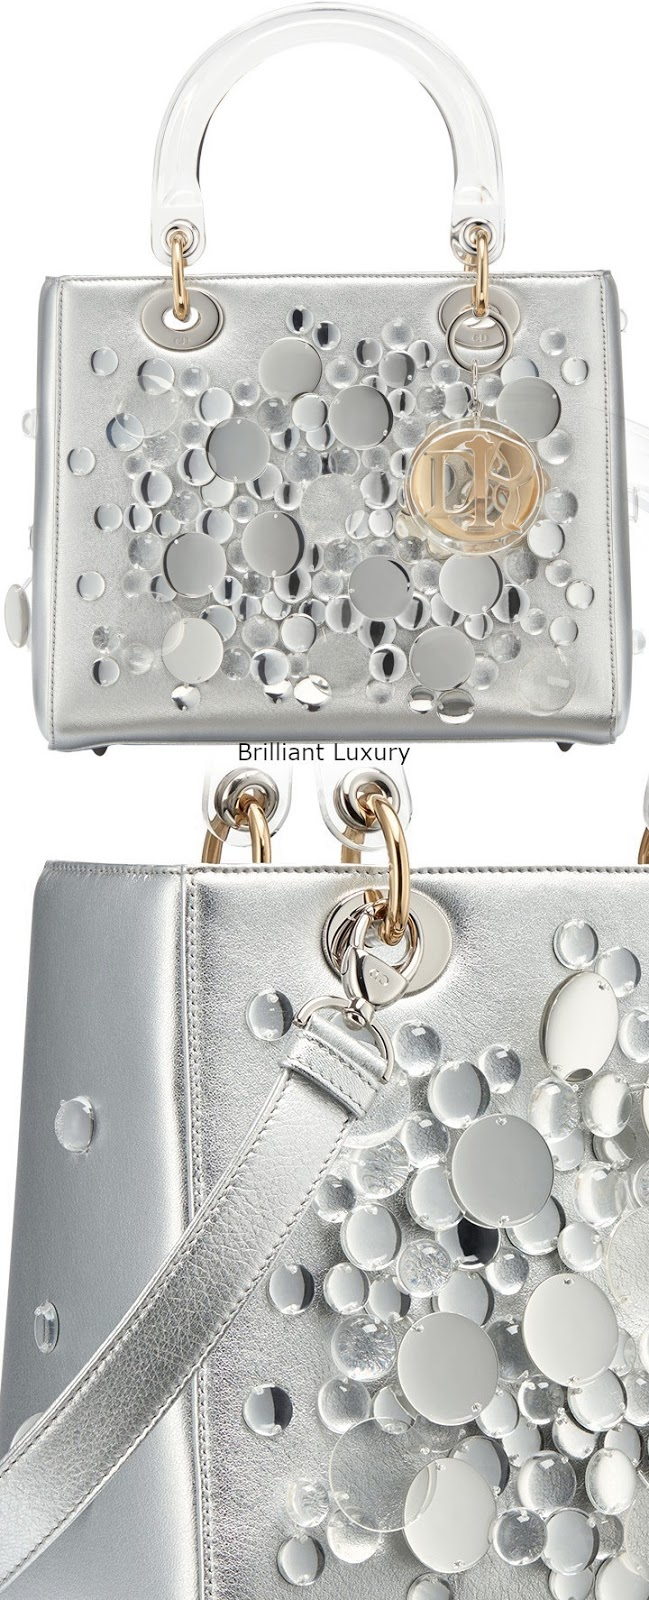 Brilliant Luxury♦Lady Dior bag, silver color metallized lambskin embroidered with transparent lenses,designer Haruka Kojin